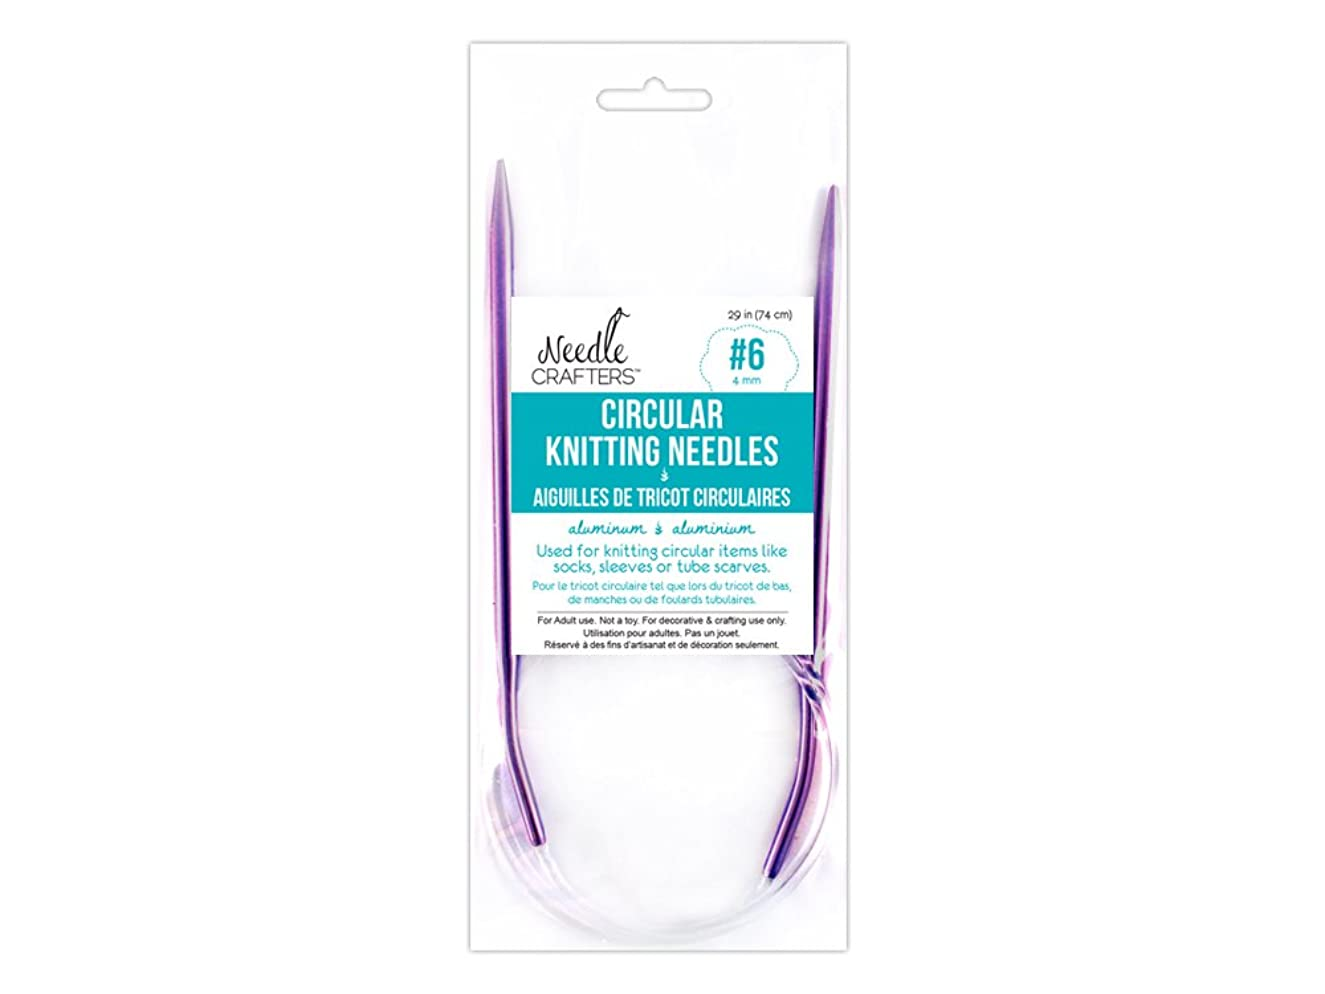 Needlecrafters Circular Knitting Needle